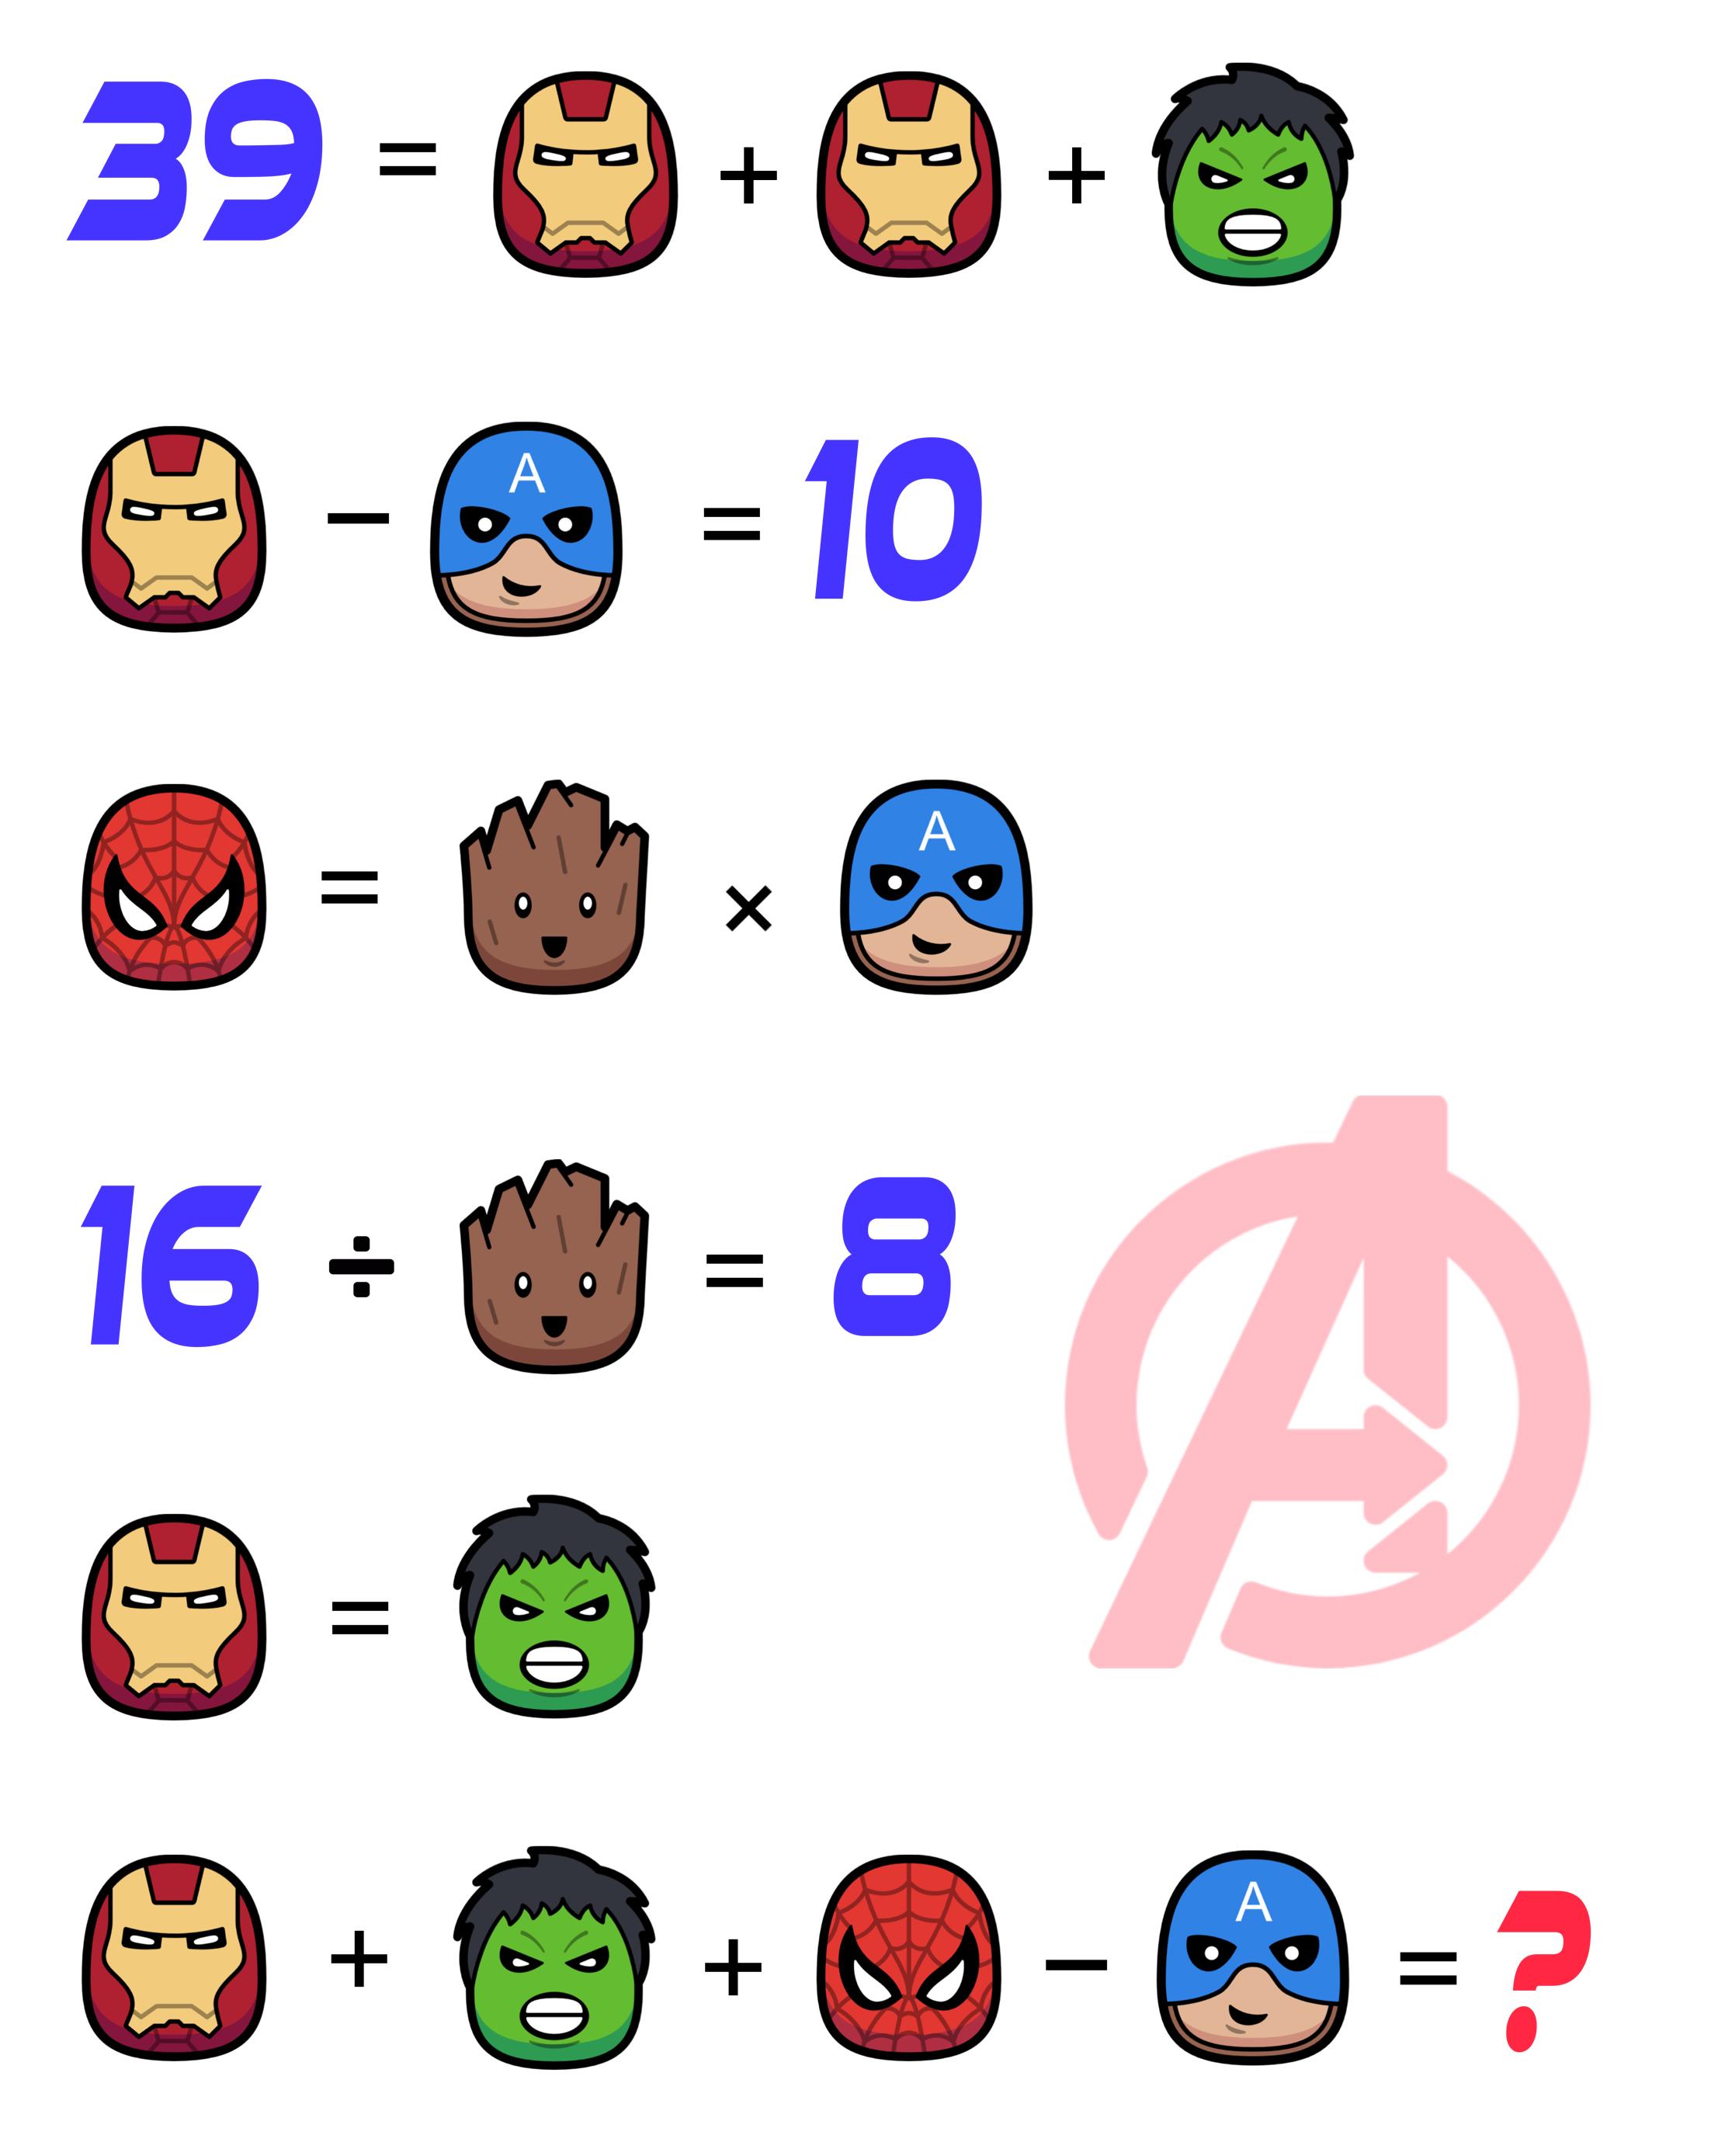 AvengersPuzzle.jpg